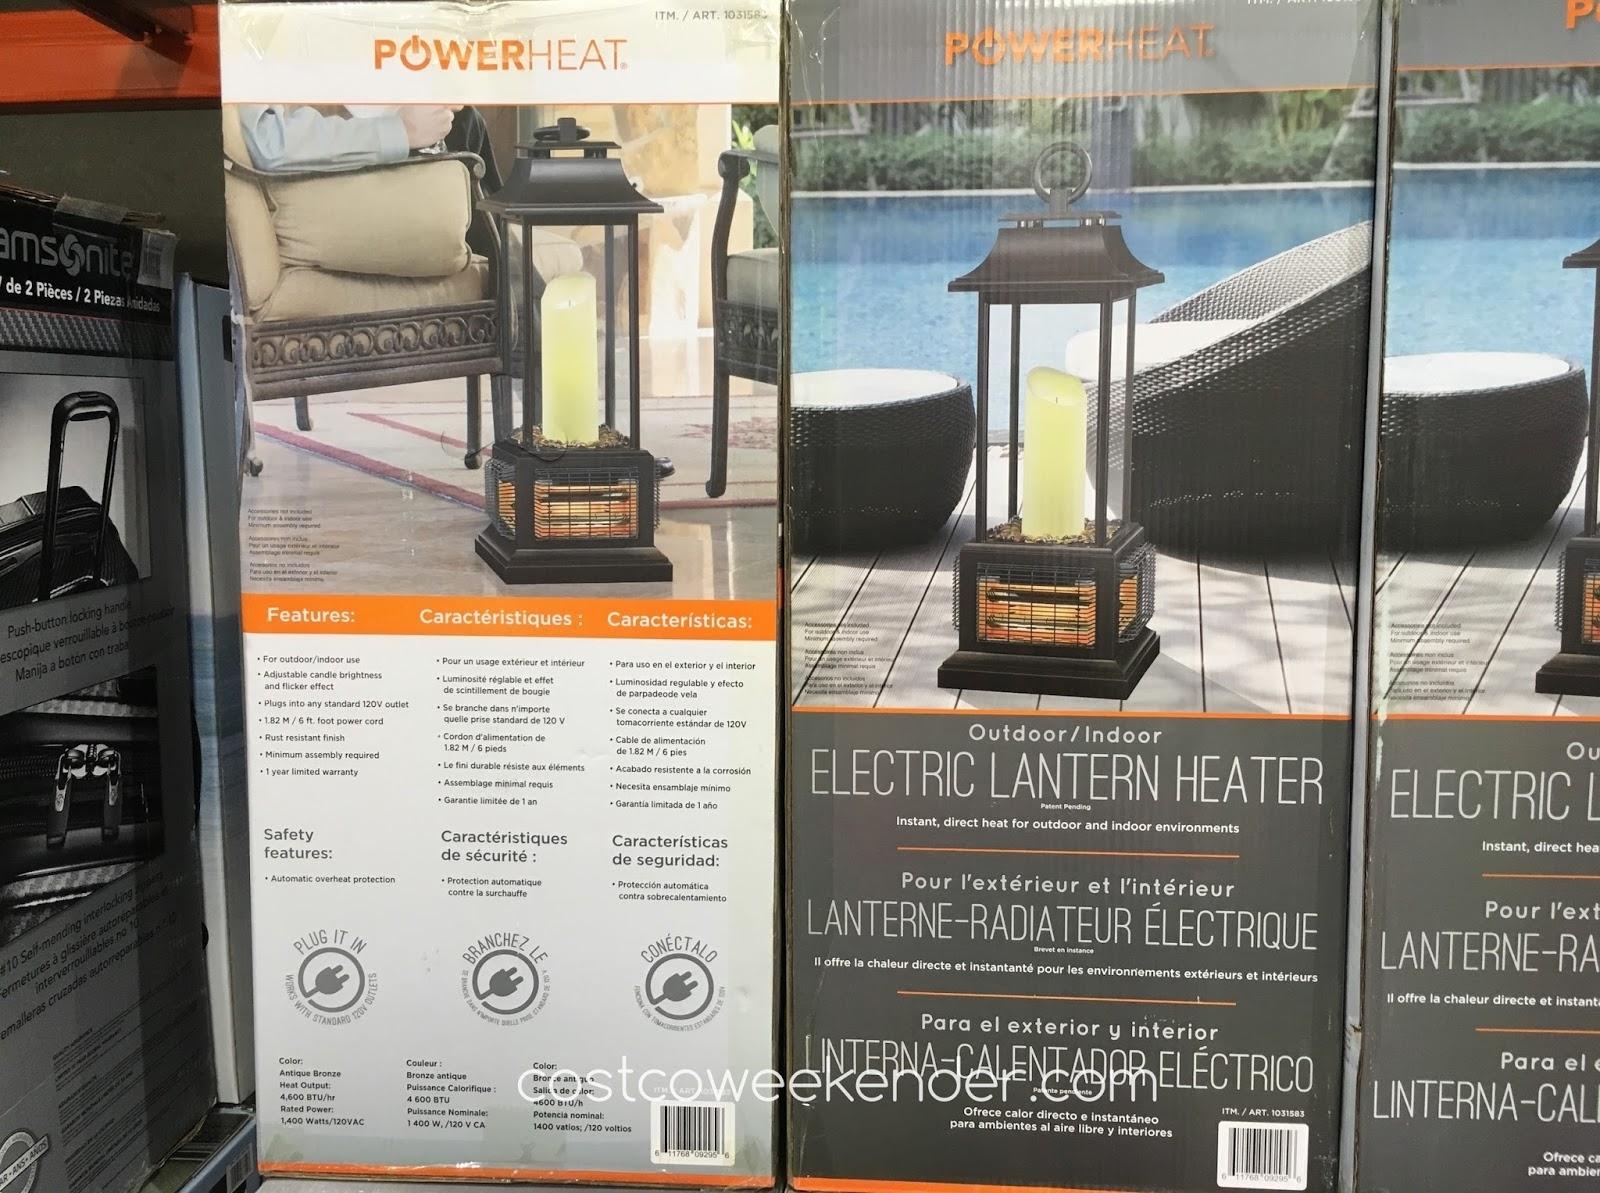 Powerheat Outdoor/indoor Electric Lantern Heater | Costco Weekender With Outdoor Patio Electric Lanterns (Photo 8 of 20)